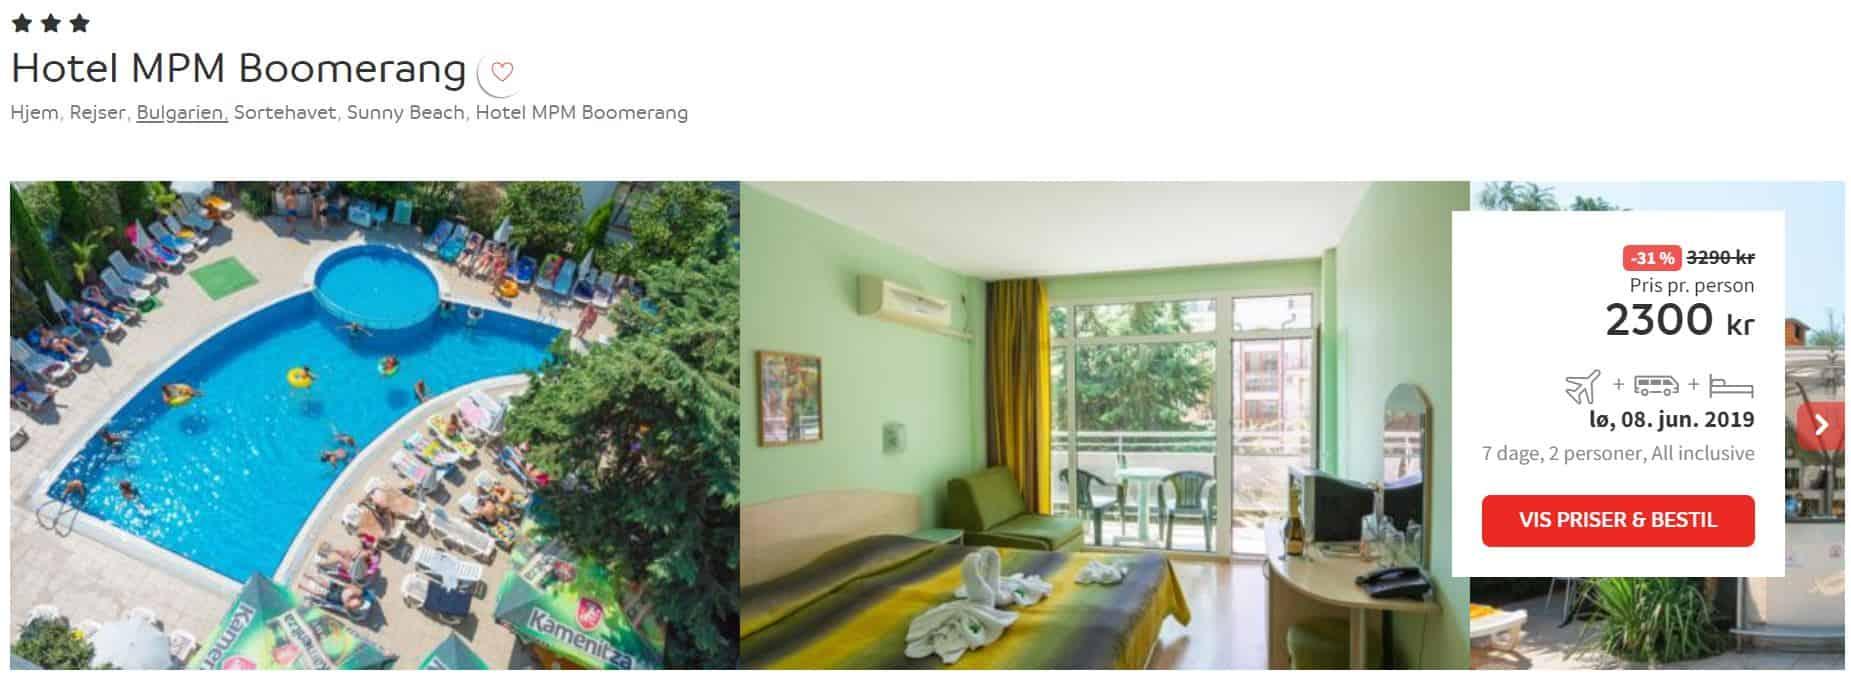 Hotel MPM Boomerang